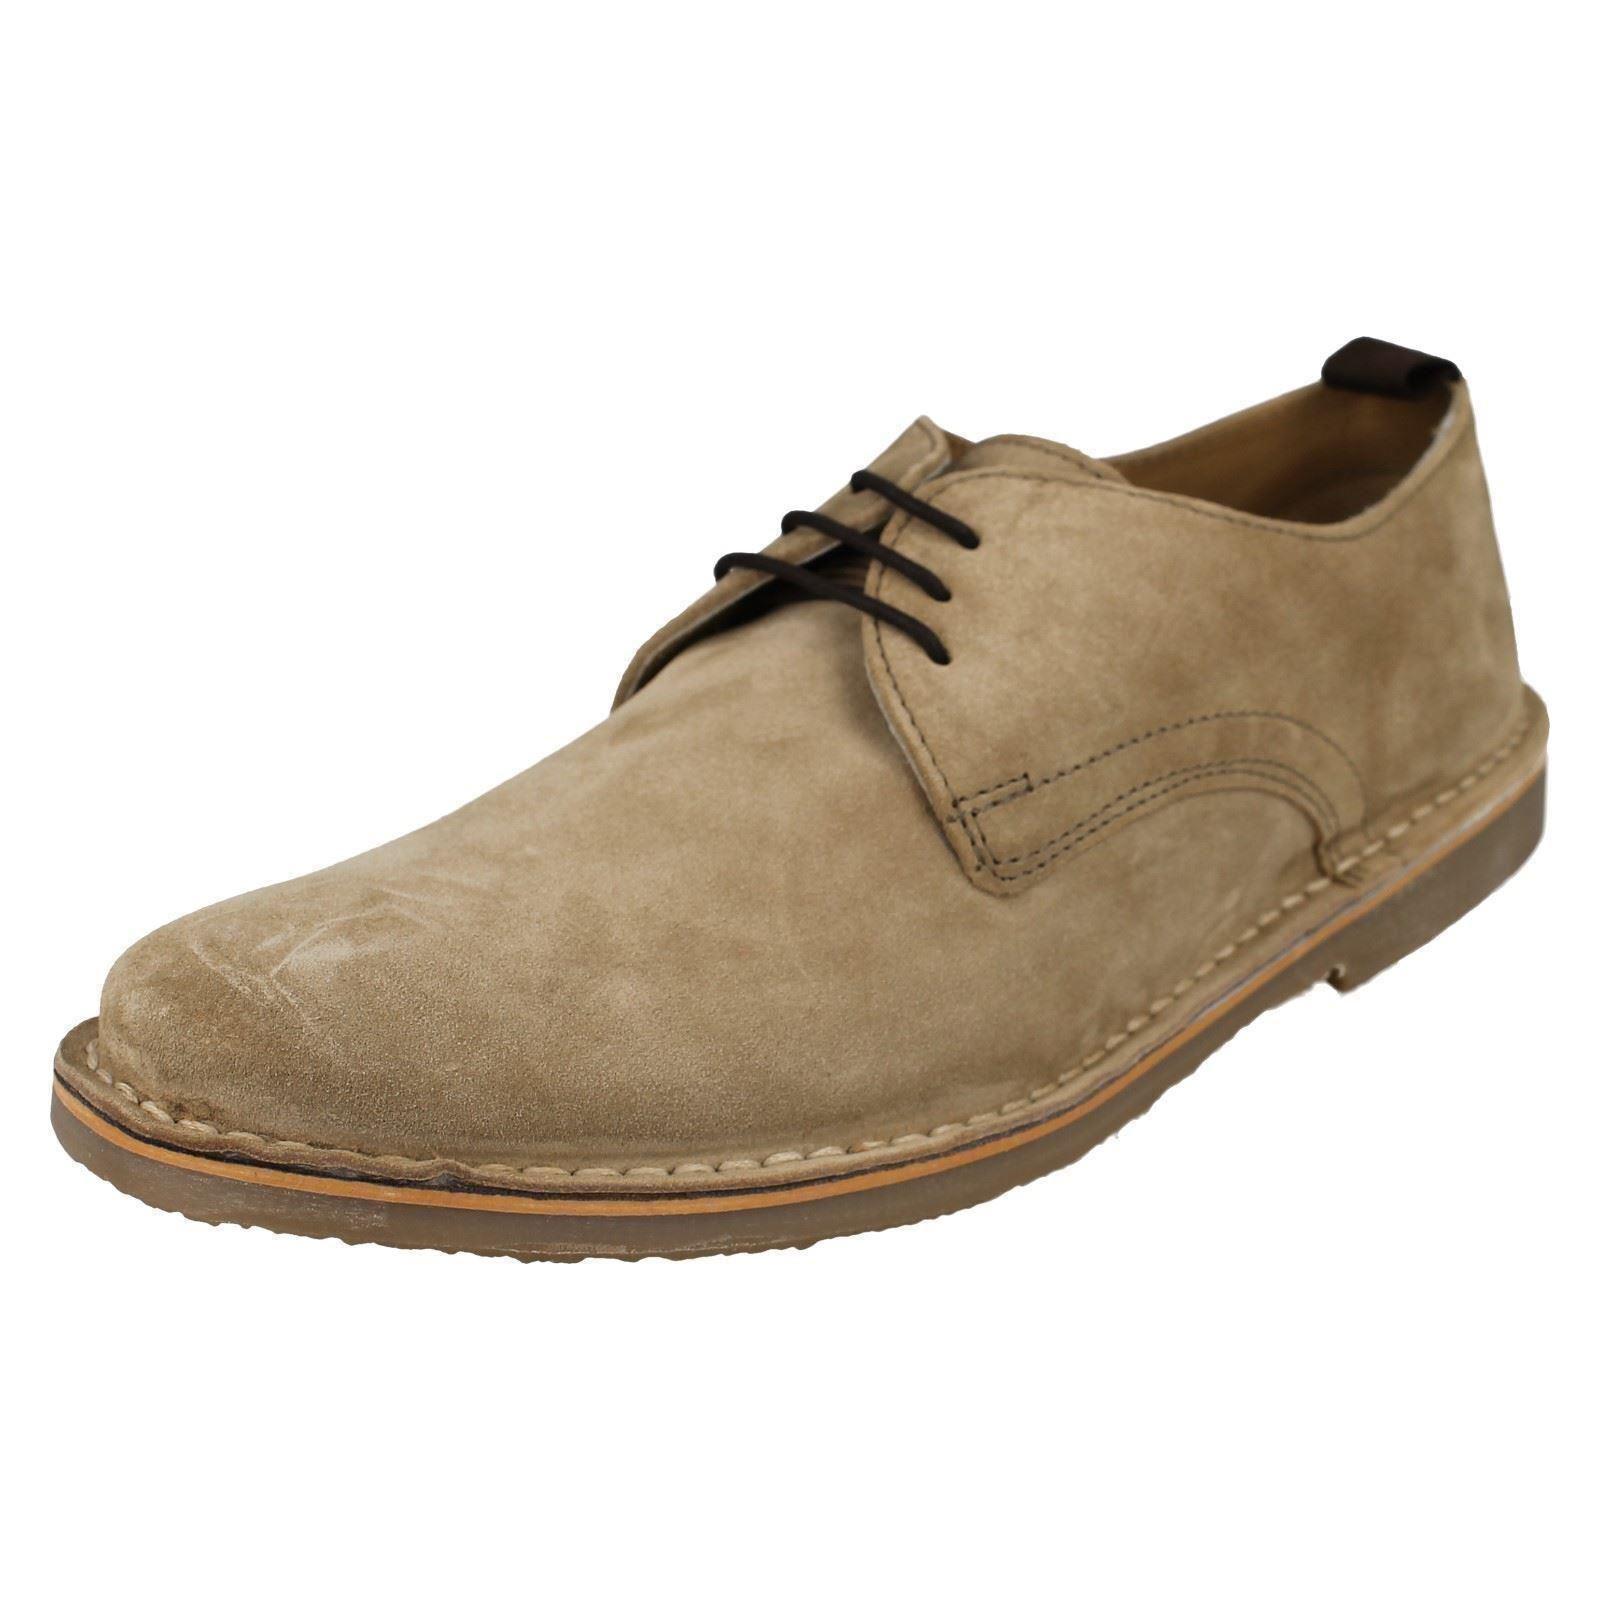 IKON BENJAMIN talpa UOMO in camoscio grigio talpa BENJAMIN scarpe con lacci a948a0